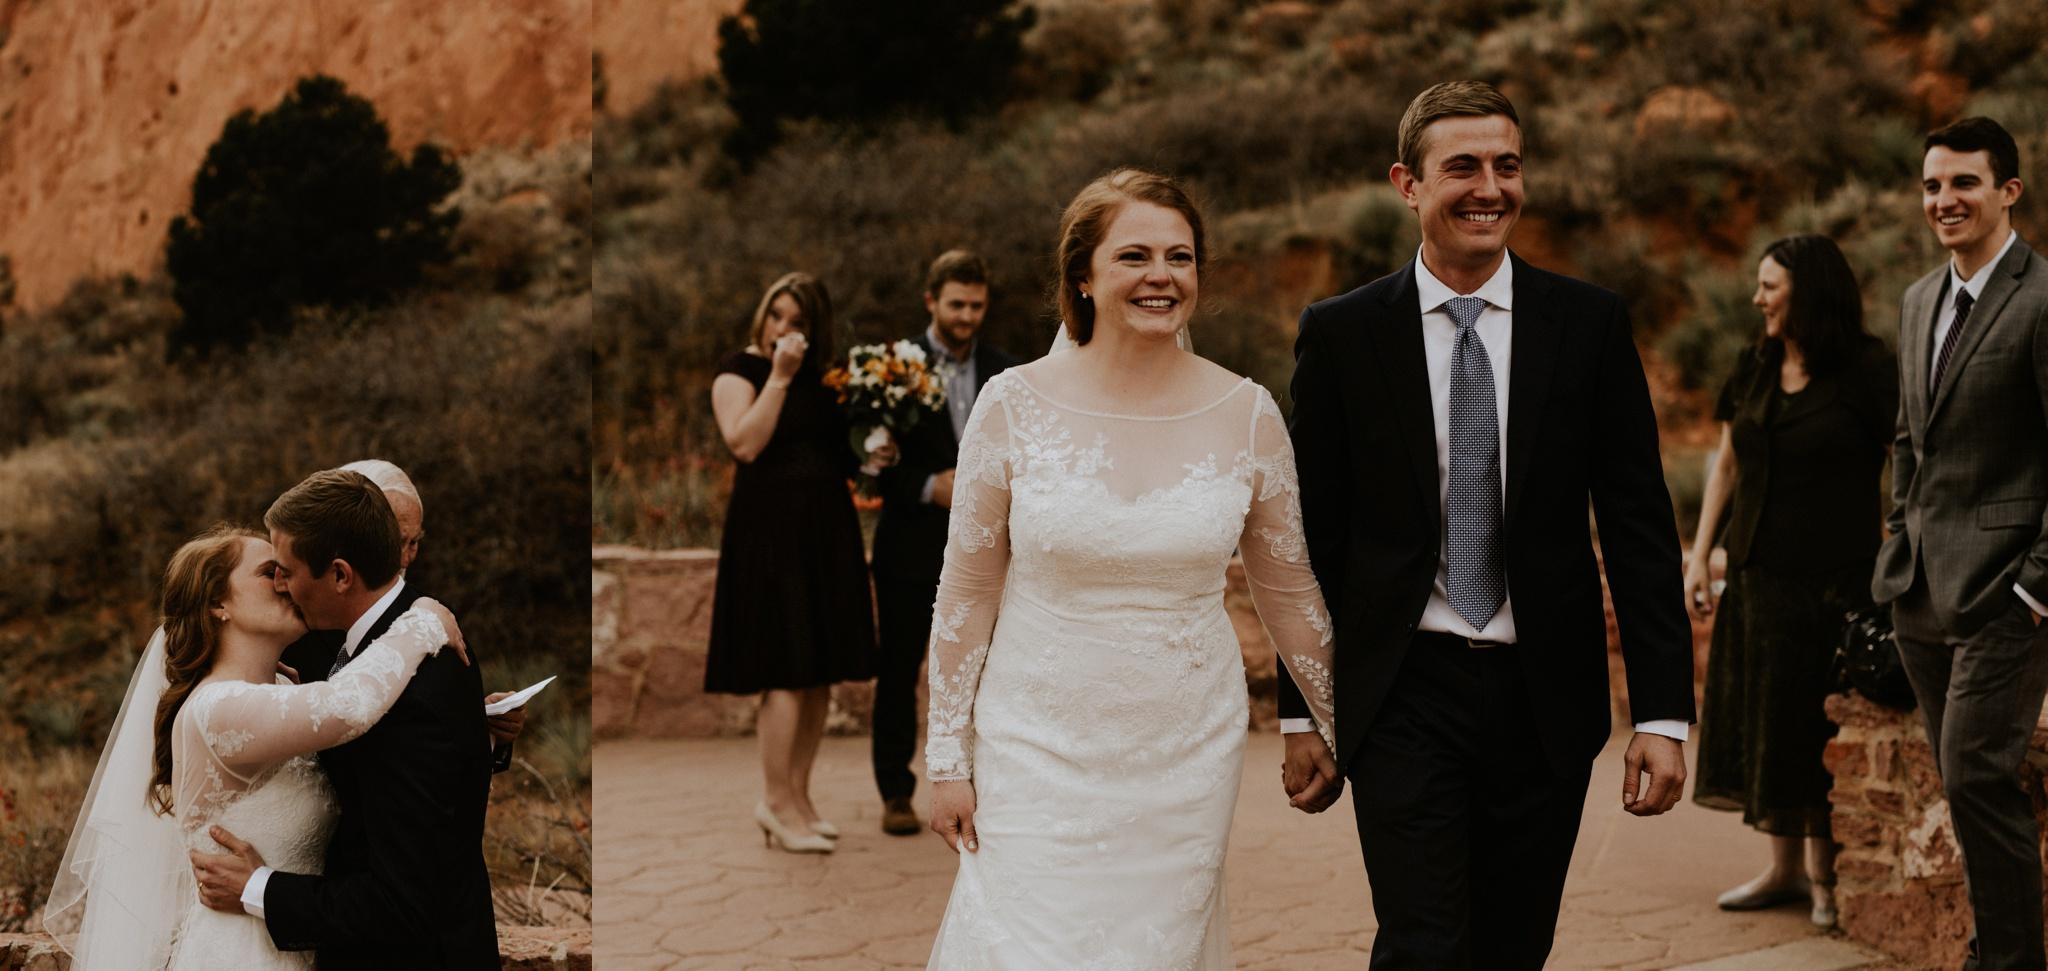 trinjensen photography, nebraska outdoor wedding photographer_2833.jpg